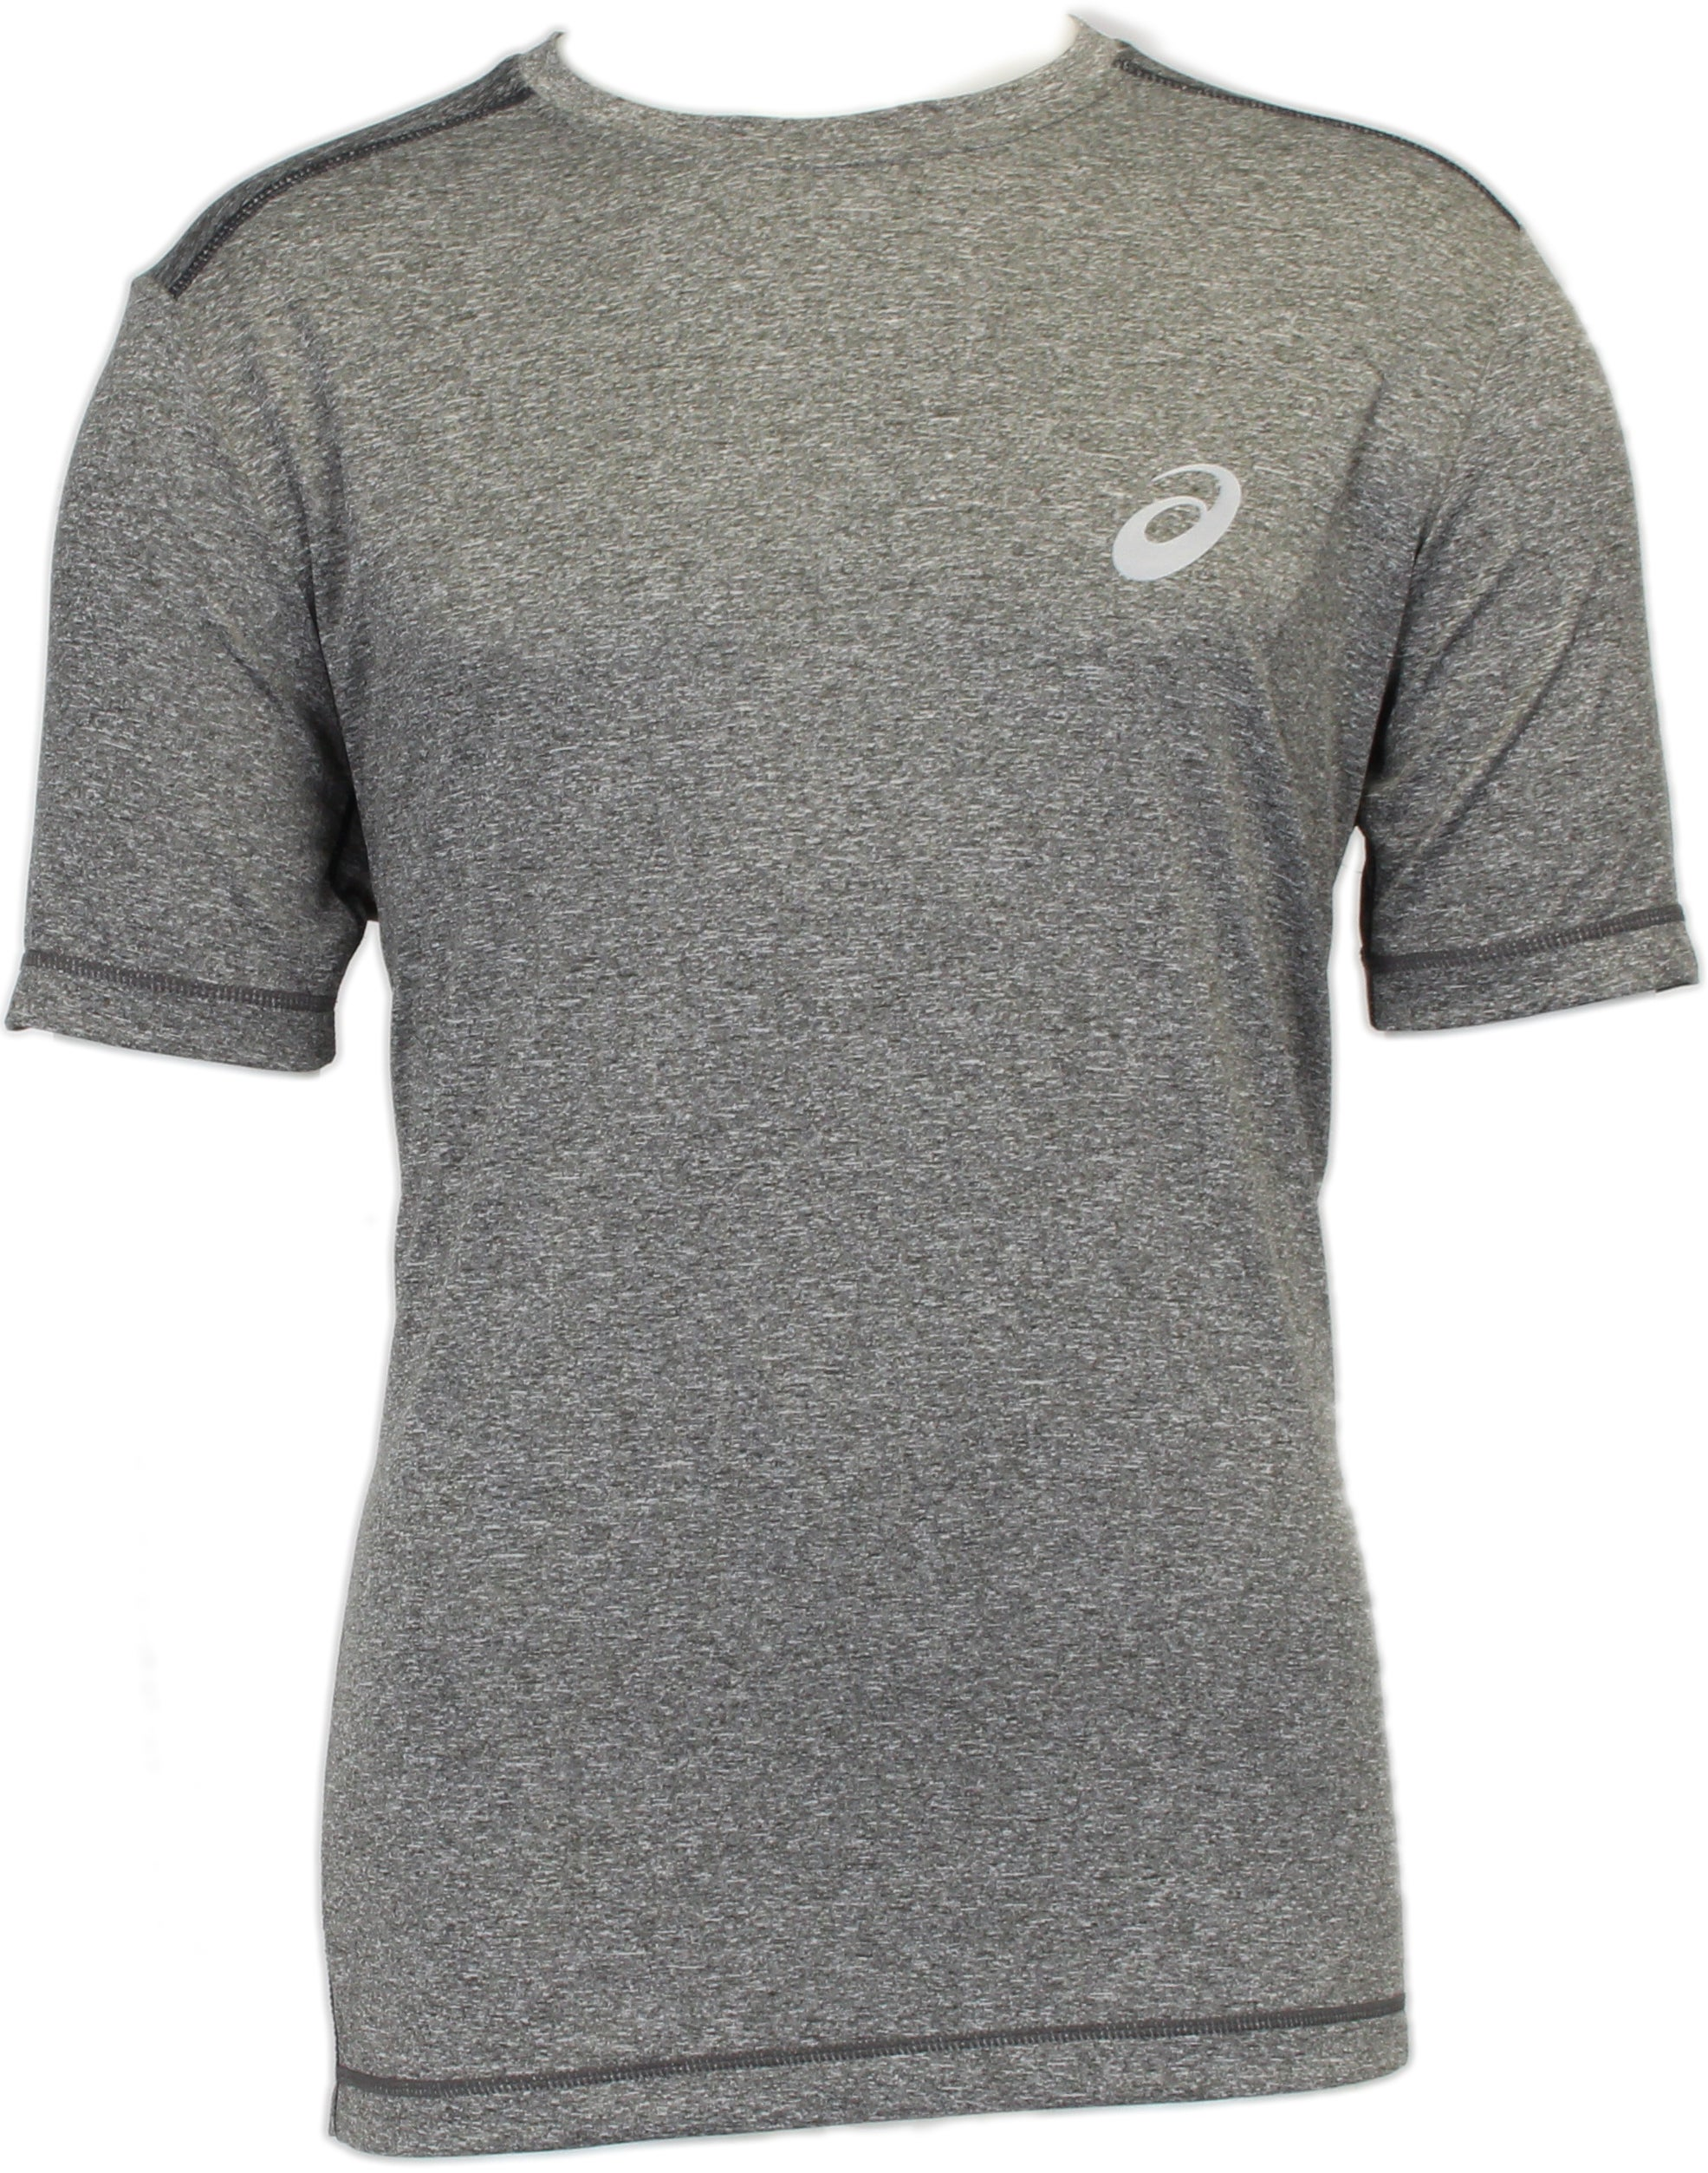 Blue asics Mens Large Logo Running Sports Gym Short Sleeve Cotton T-Shirt